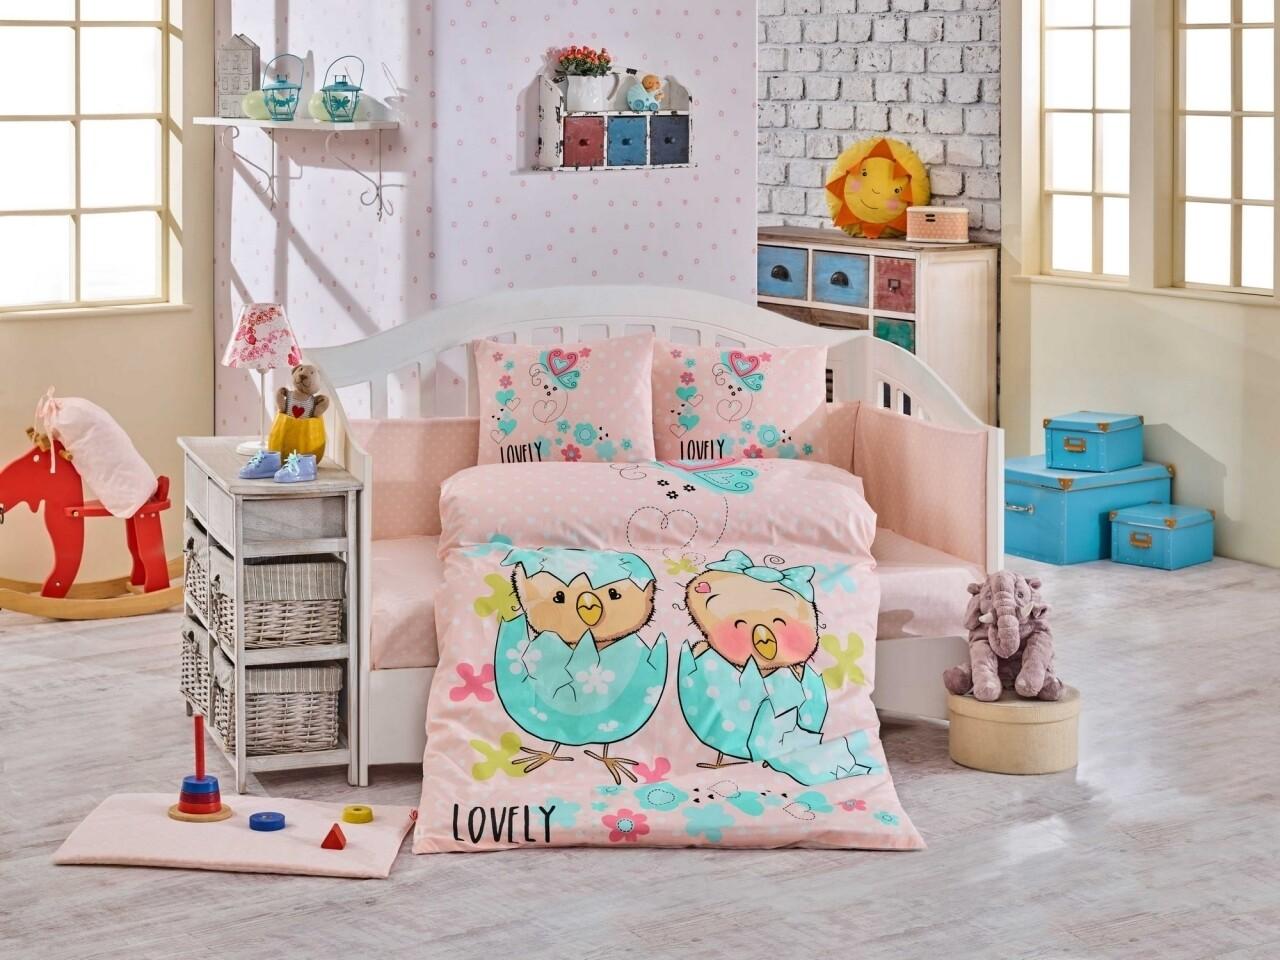 Lenjerie de pat pentru copii, 4 piese, 100% bumbac poplin, Hobby, Lovely, somon